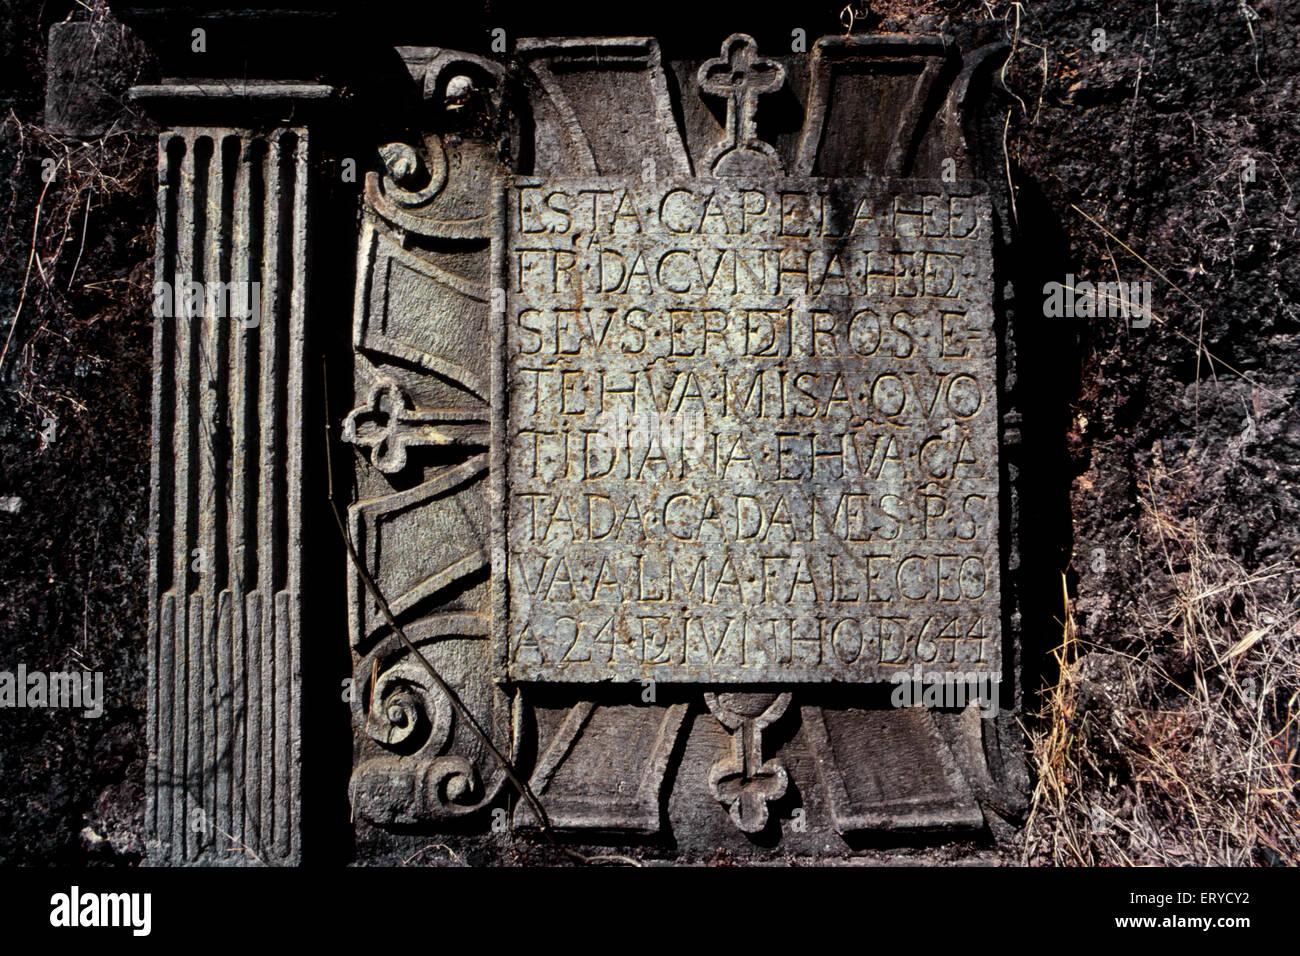 La antigua Goa script en piedra antigua India ; Imagen De Stock